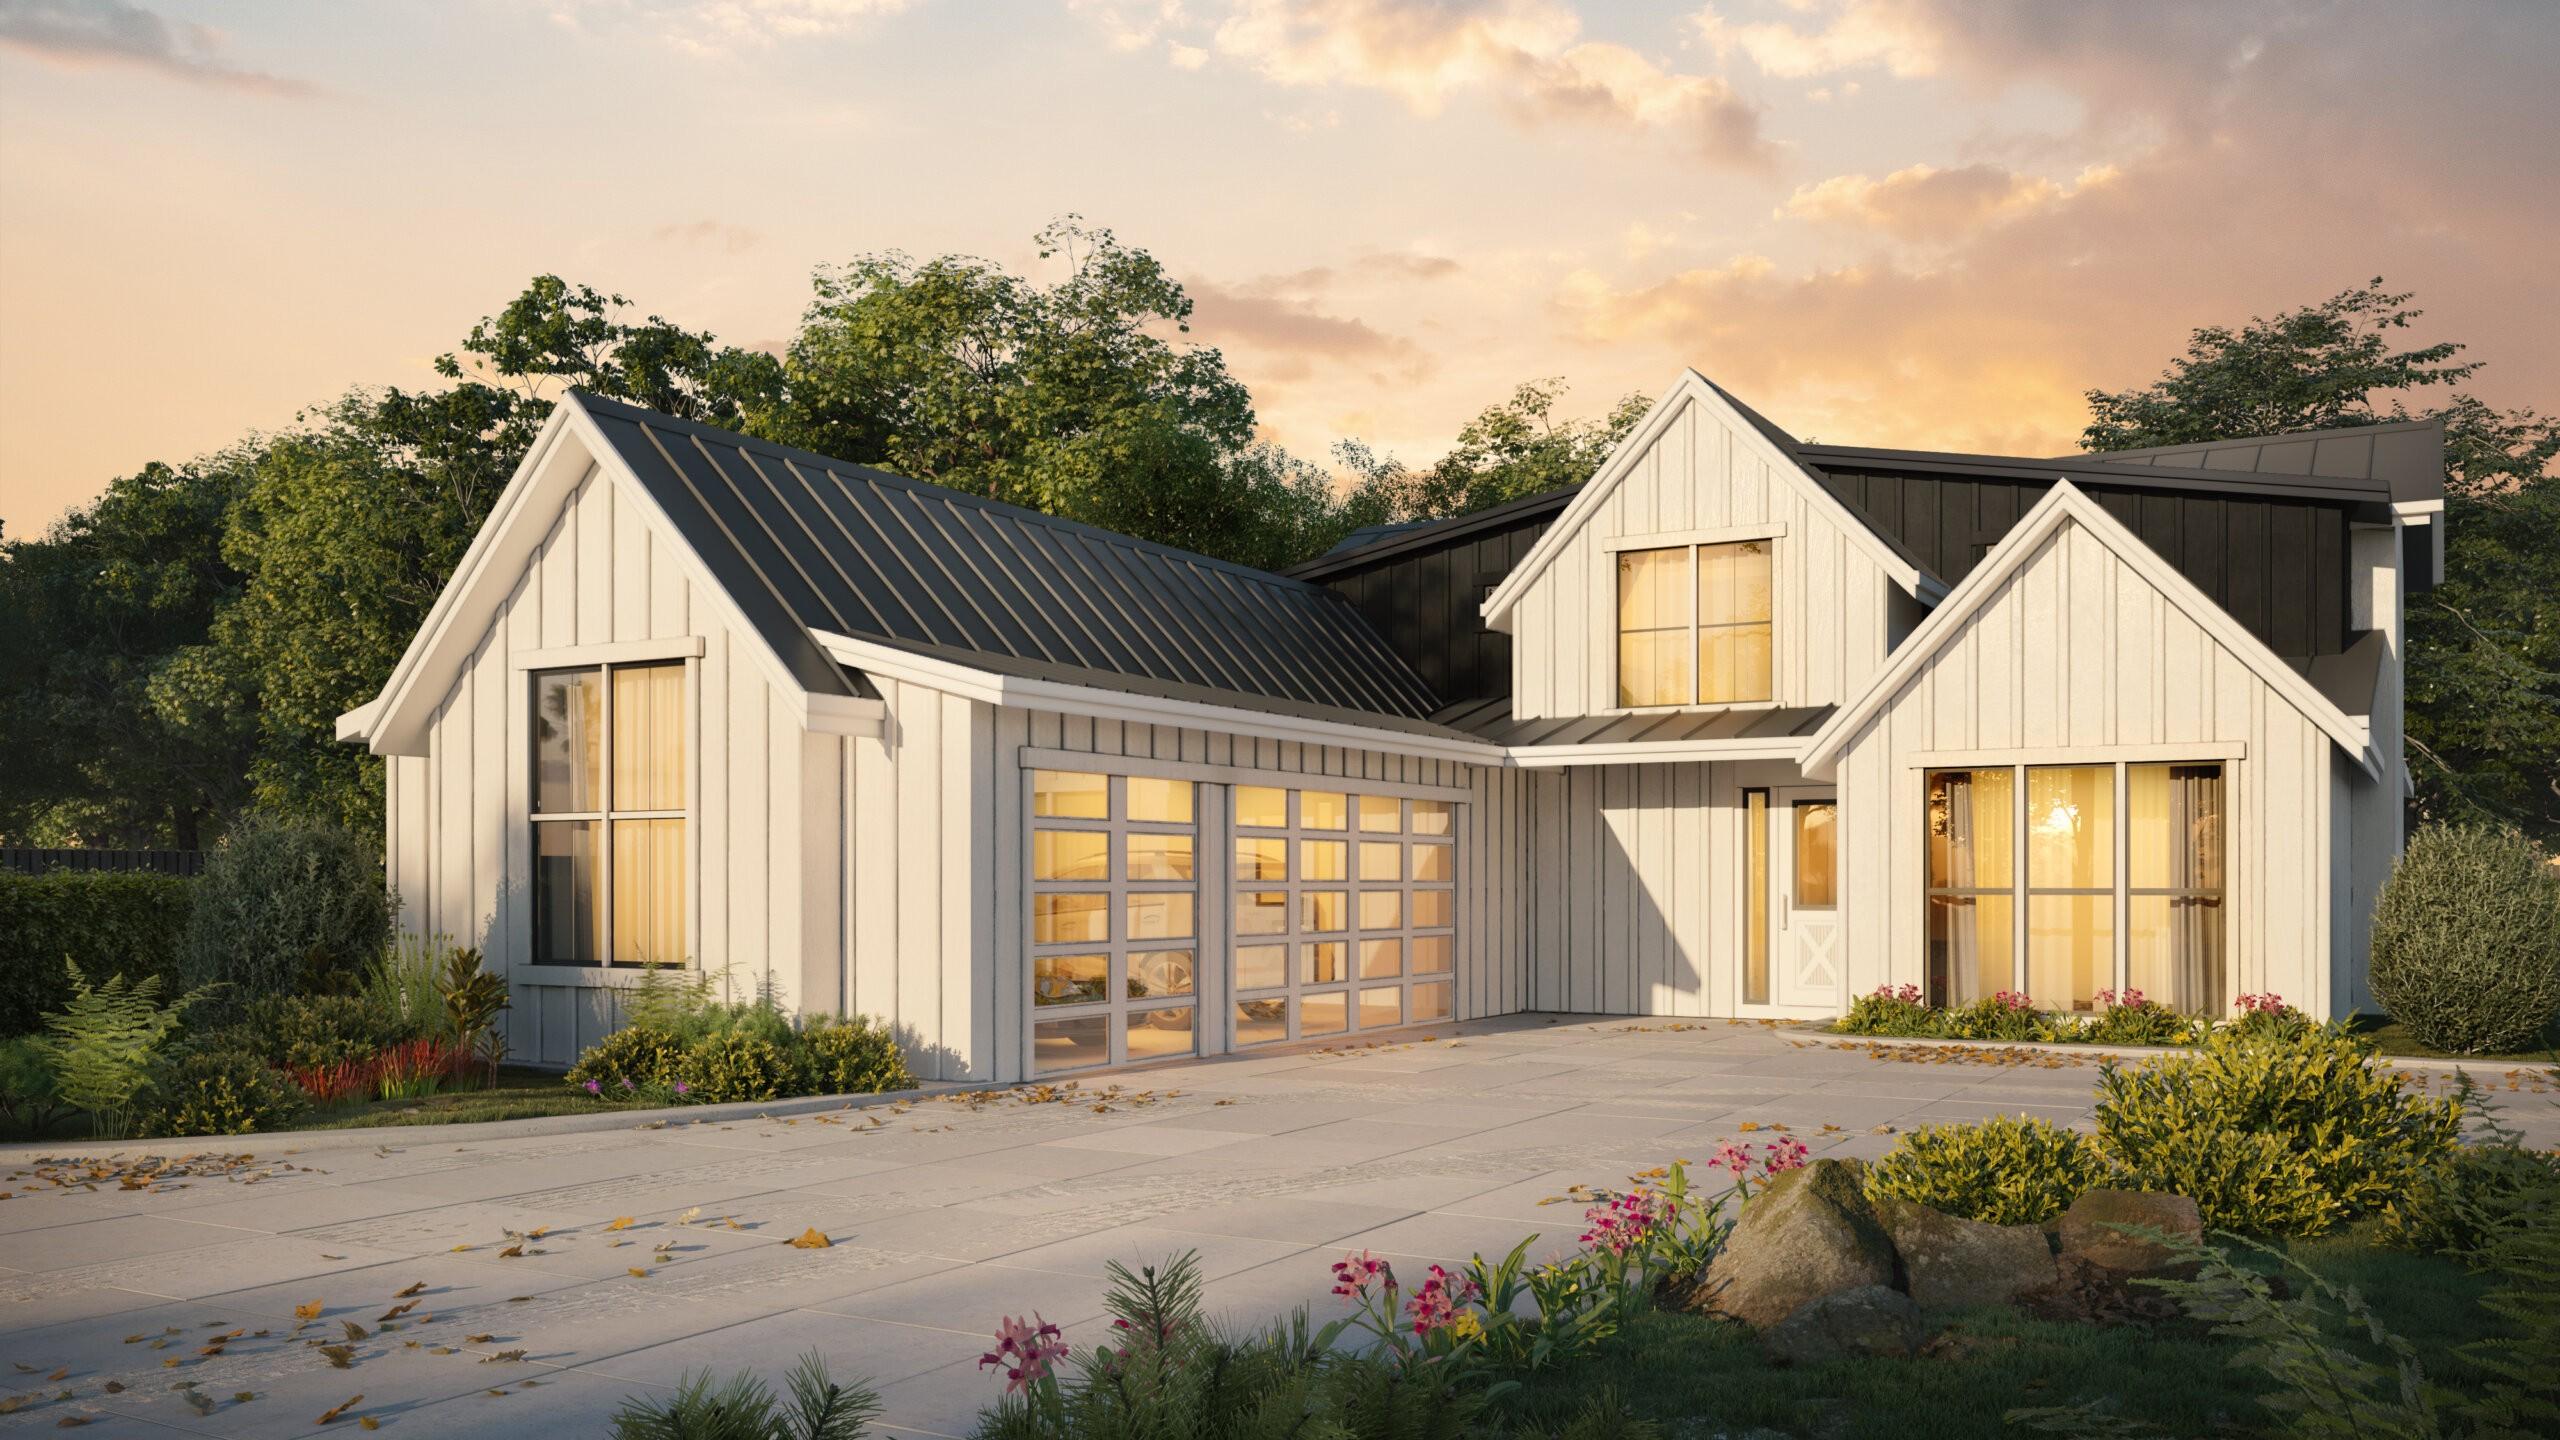 Farmhouse Plans Modern Farmhouse Designs Home Plans